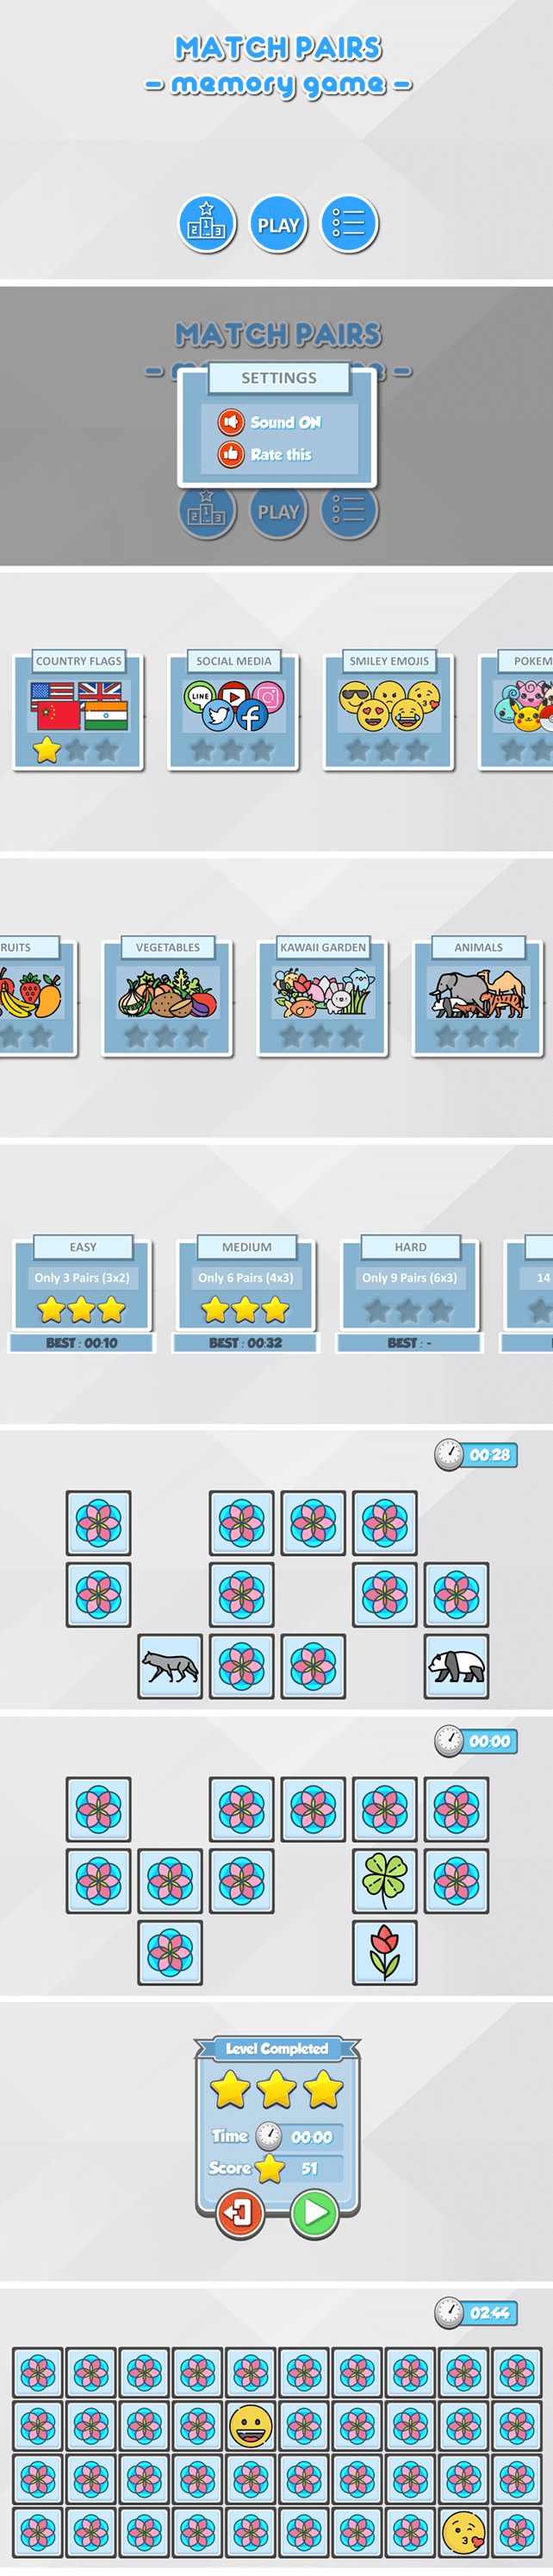 Match Pairs (Memory Game)